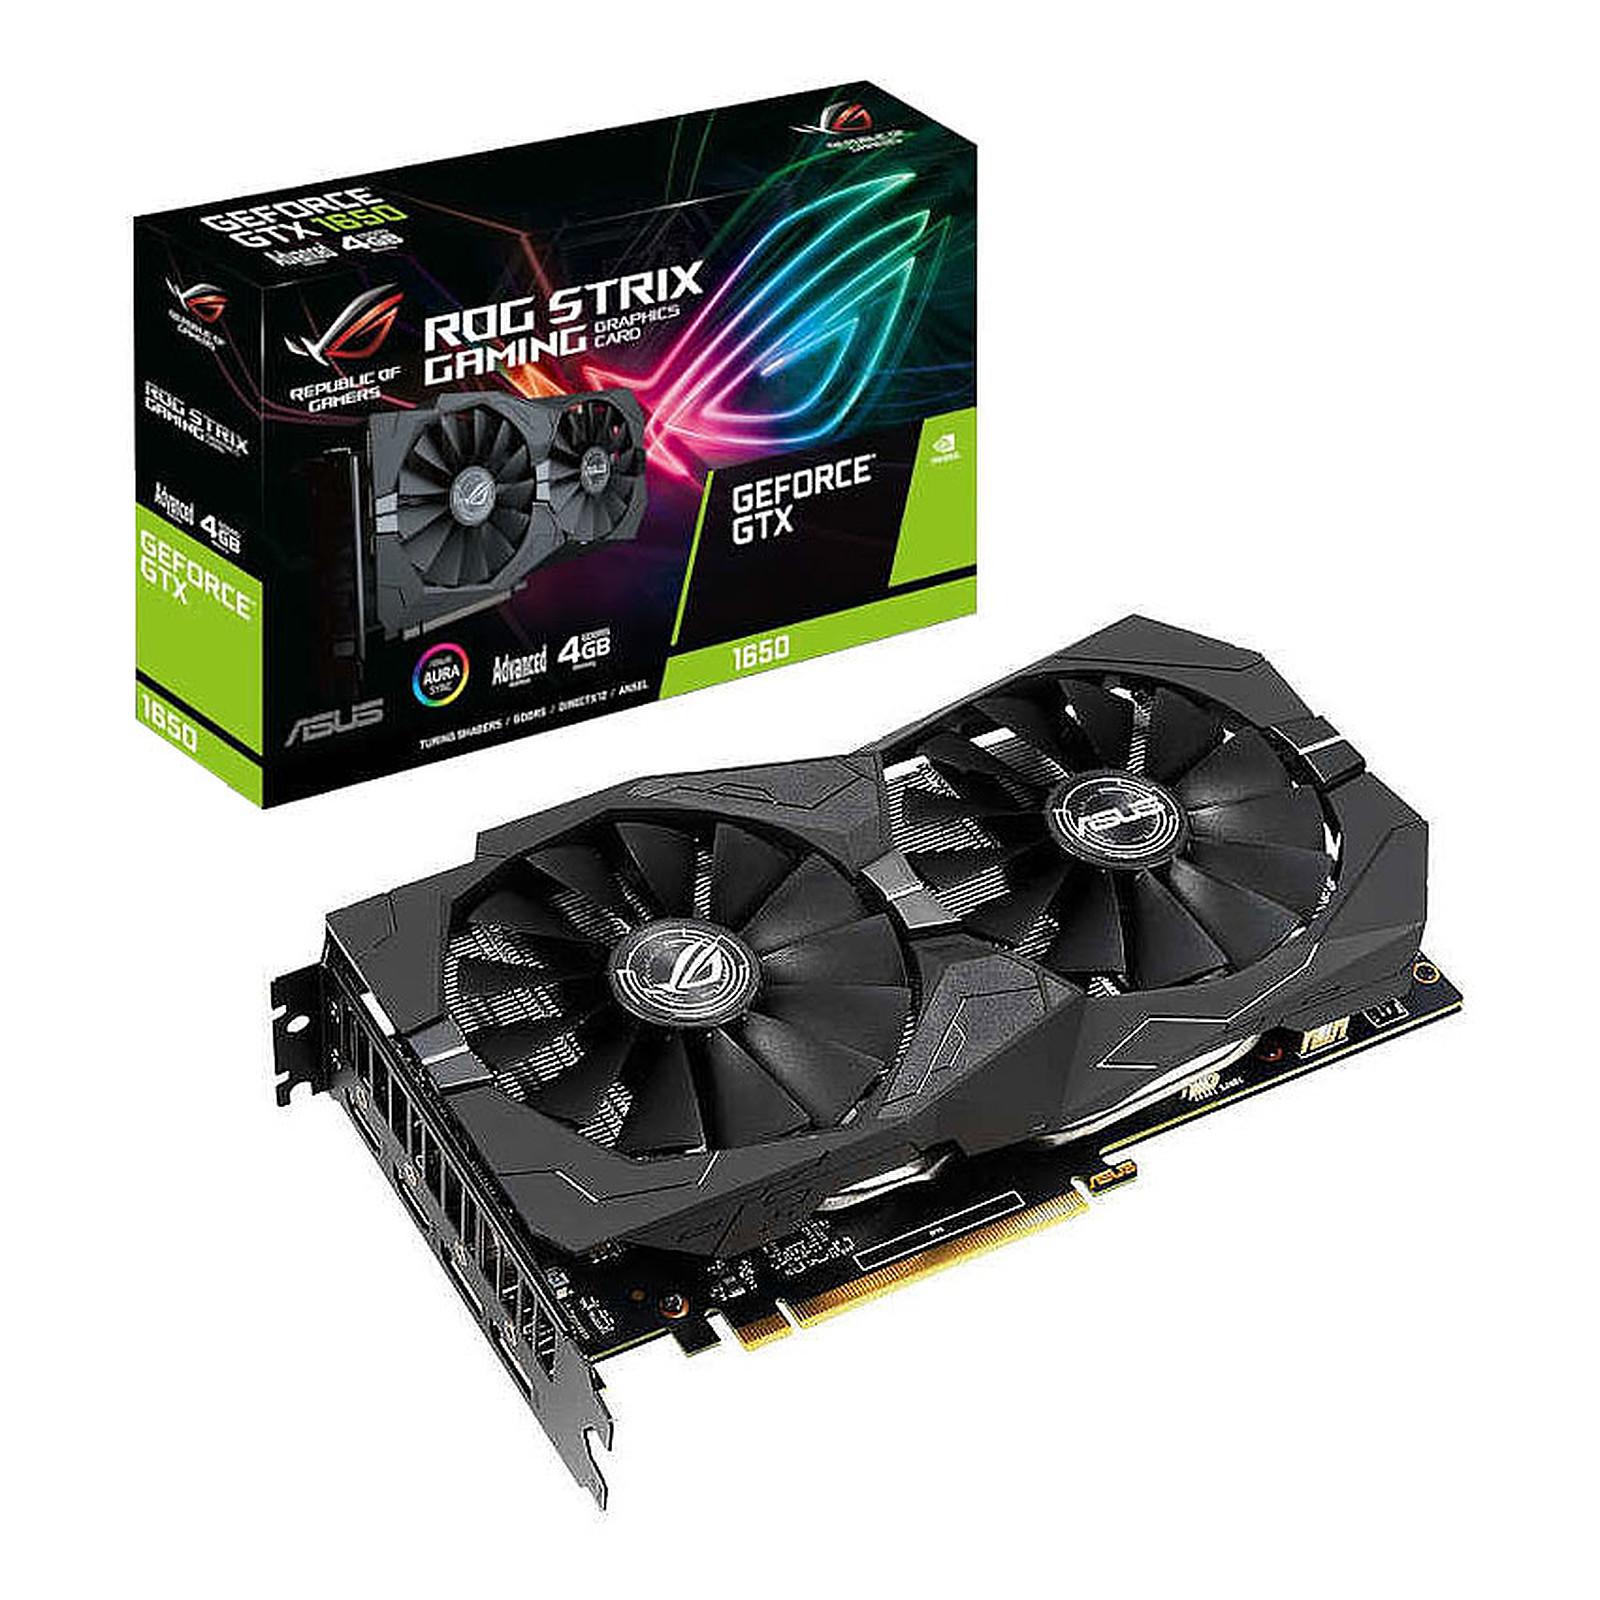 ASUS GeForce GTX 1650 ROG-STRIX-GTX1650-A4G-GAMING